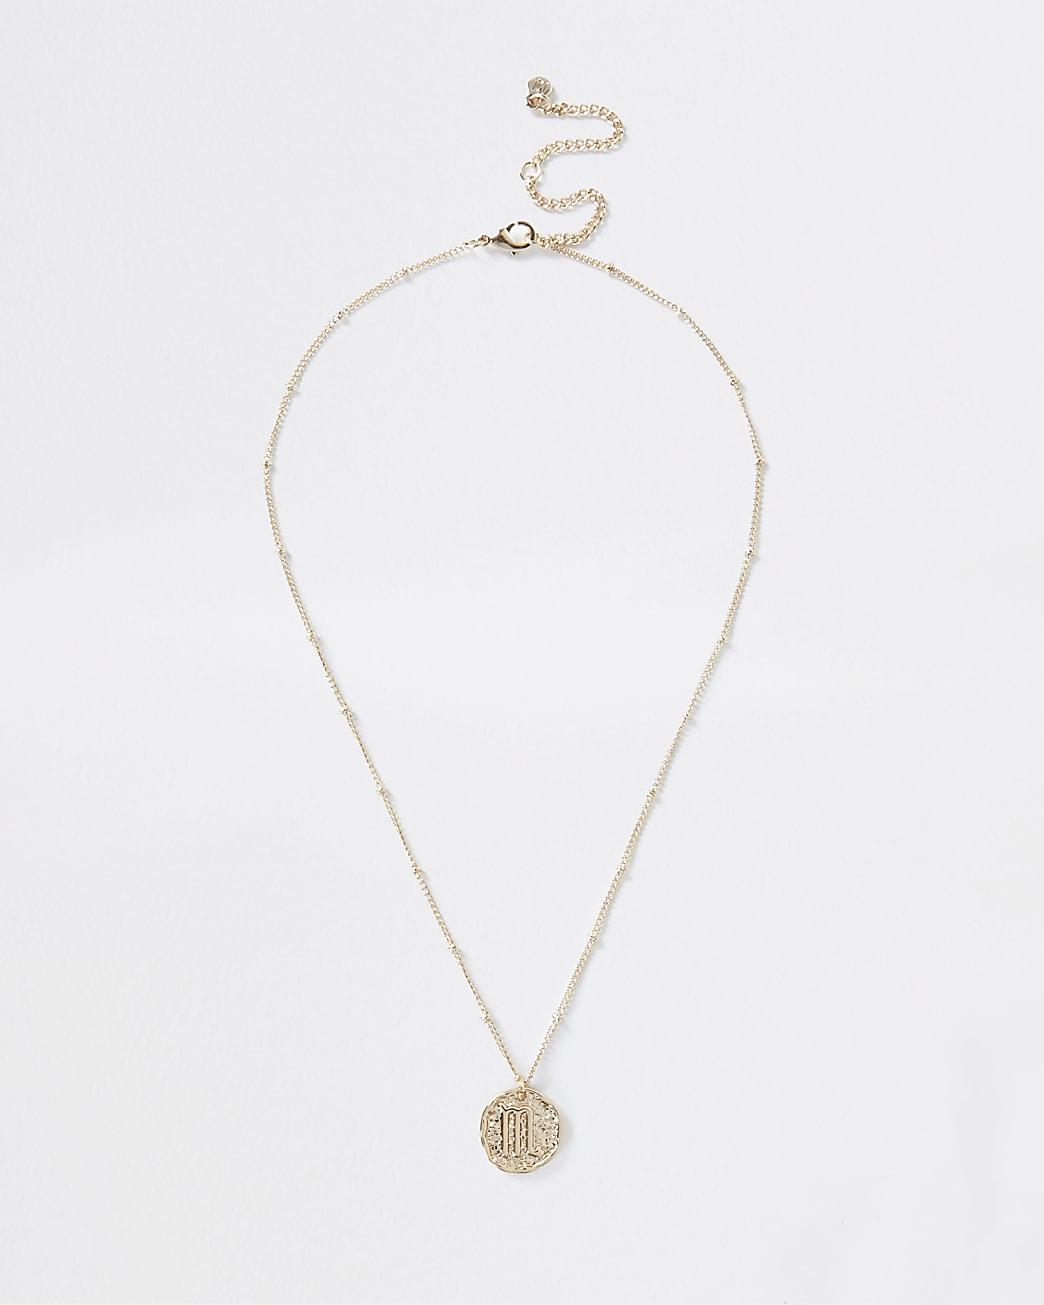 Gold Scorpio horoscope coin necklace